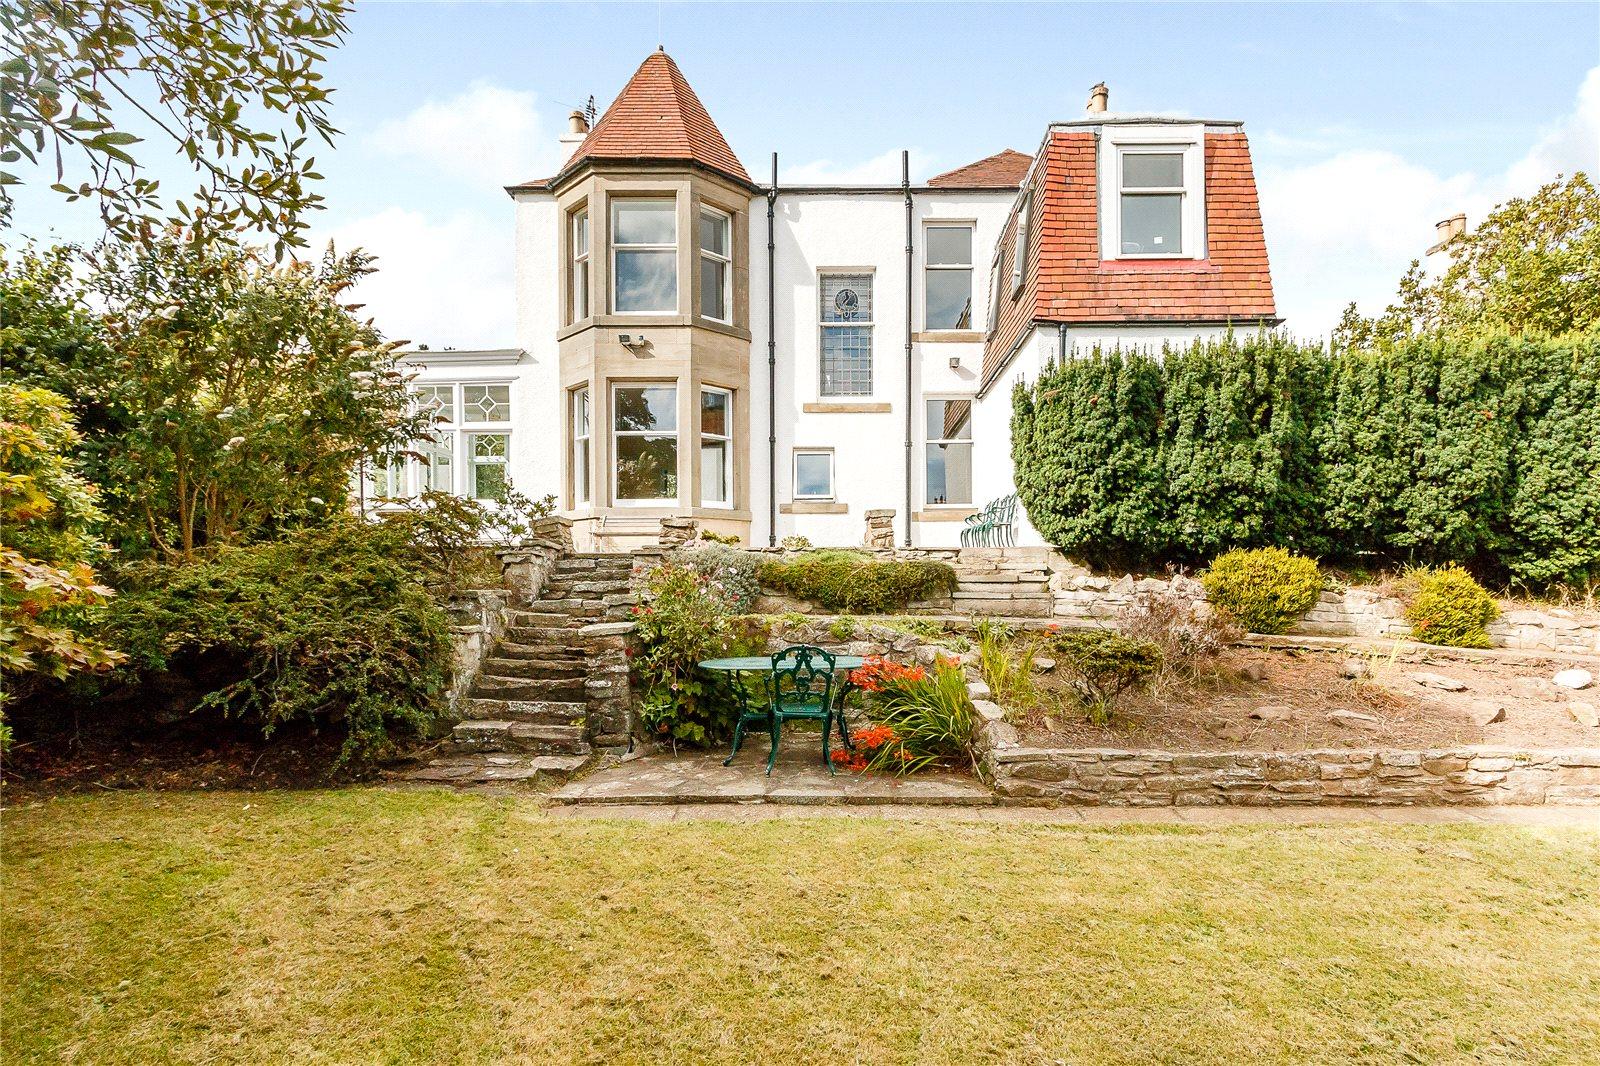 Single Family Home for Sale at Craighill Gardens, Edinburgh, EH10 Edinburgh, Scotland